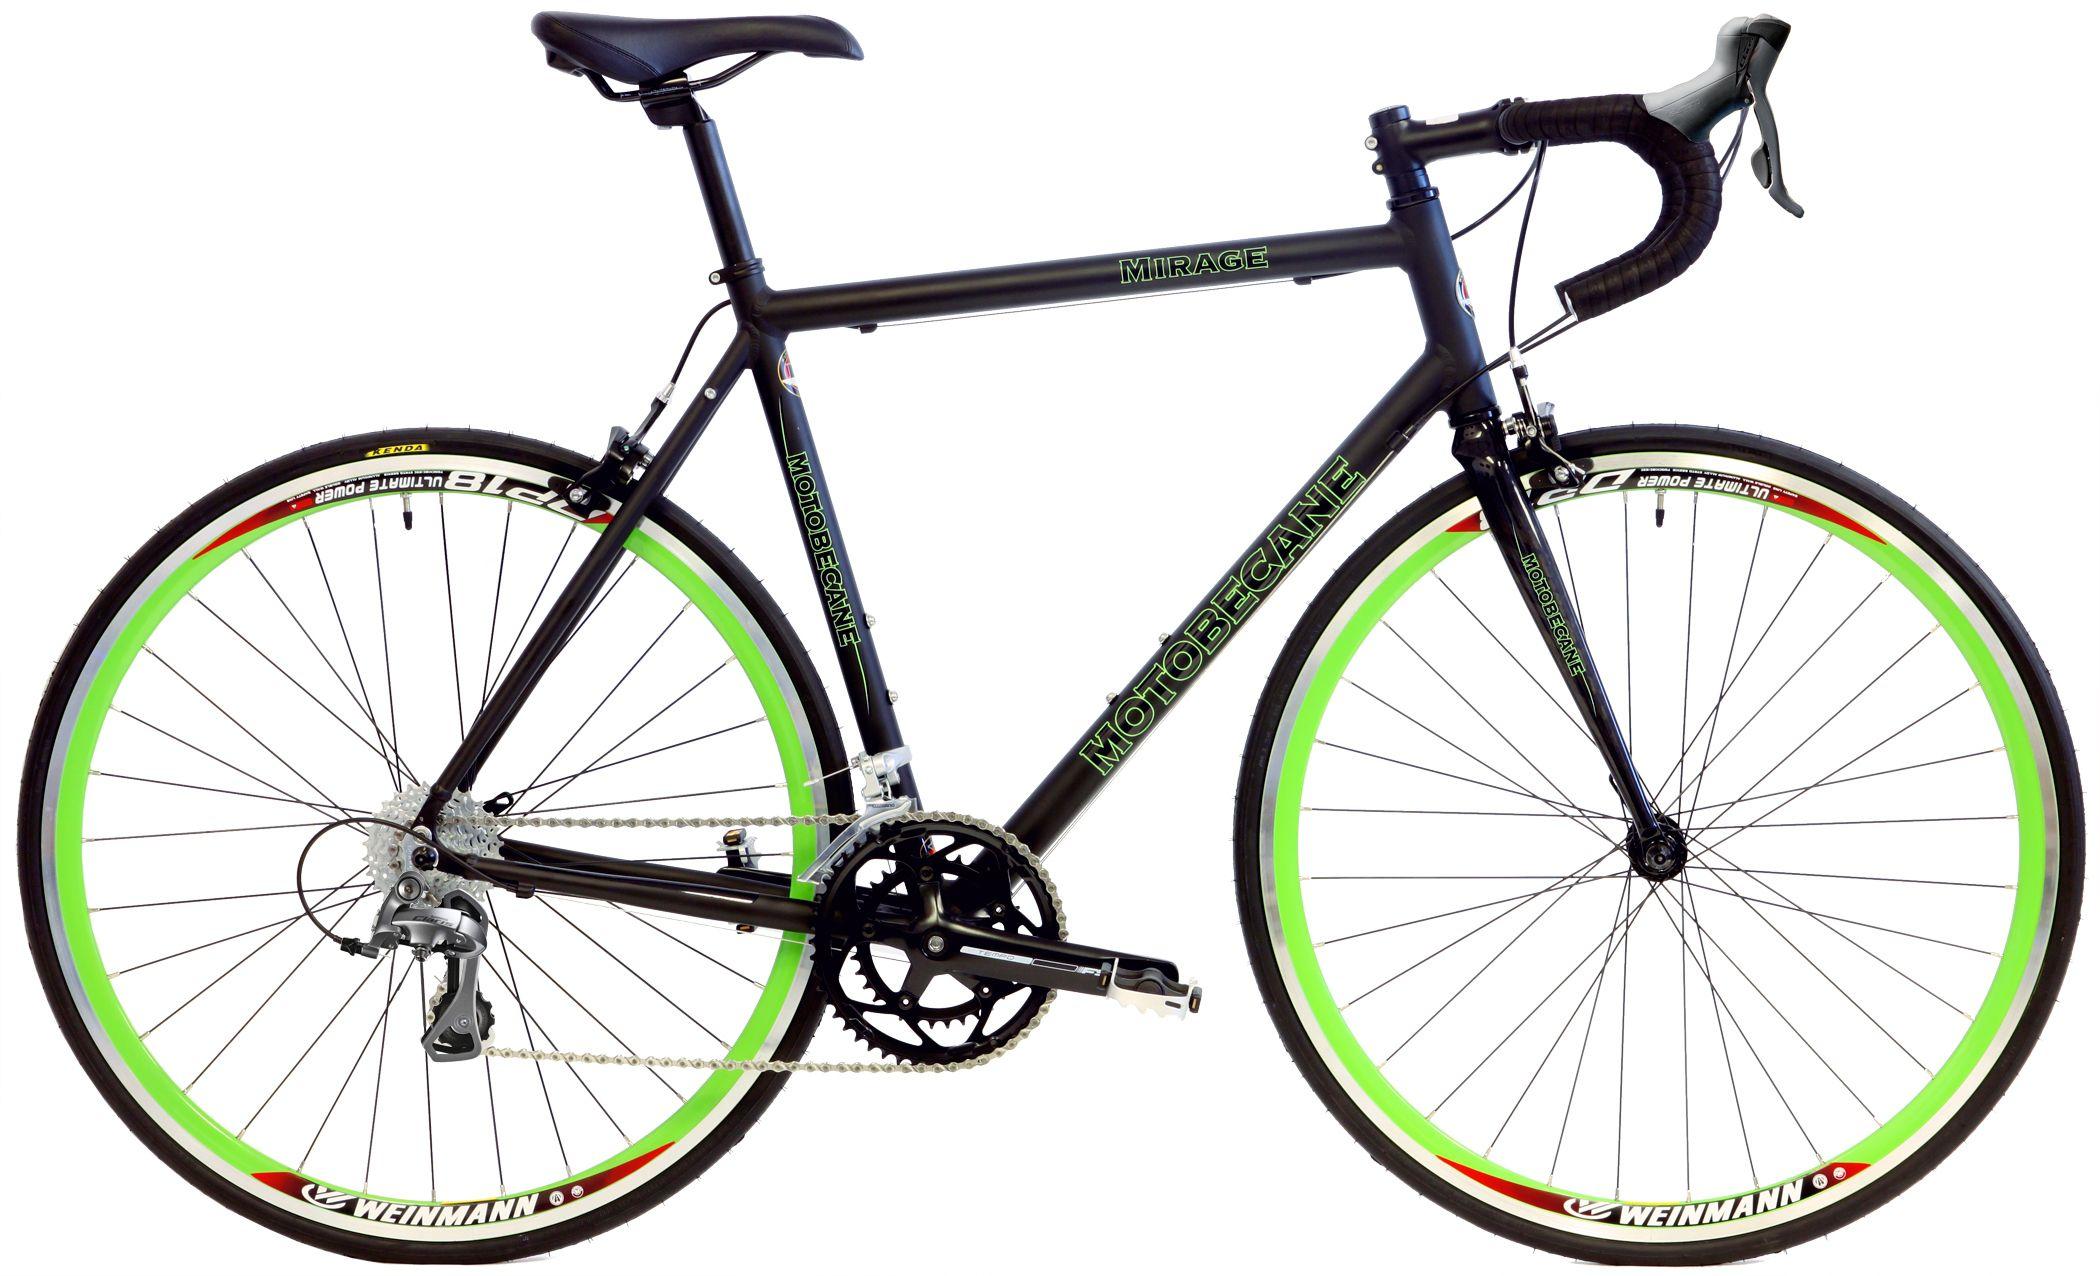 7fb40b0807c Road Bikes - Motobecane Mirage S | Wish List